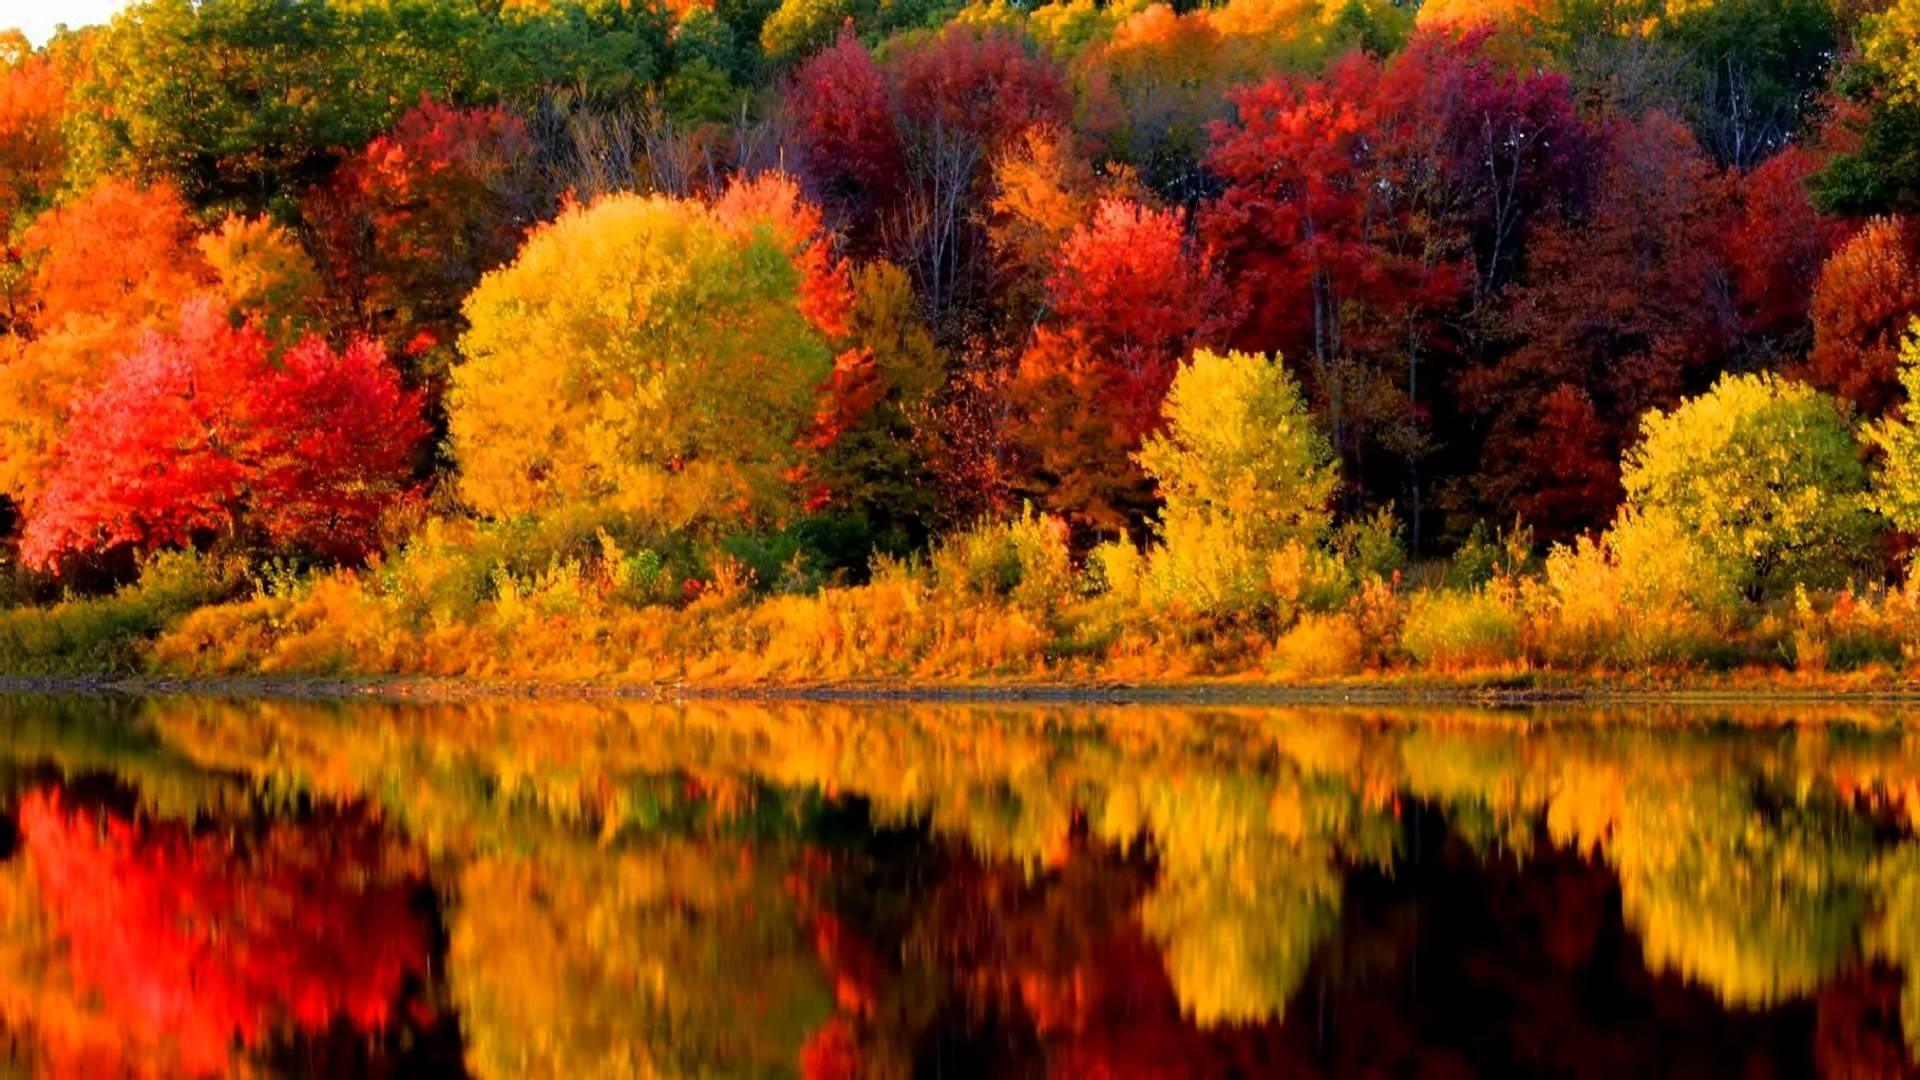 Fall Foliage Iphone Wallpaper Screensavers Wallpaper For Fall 46 Images